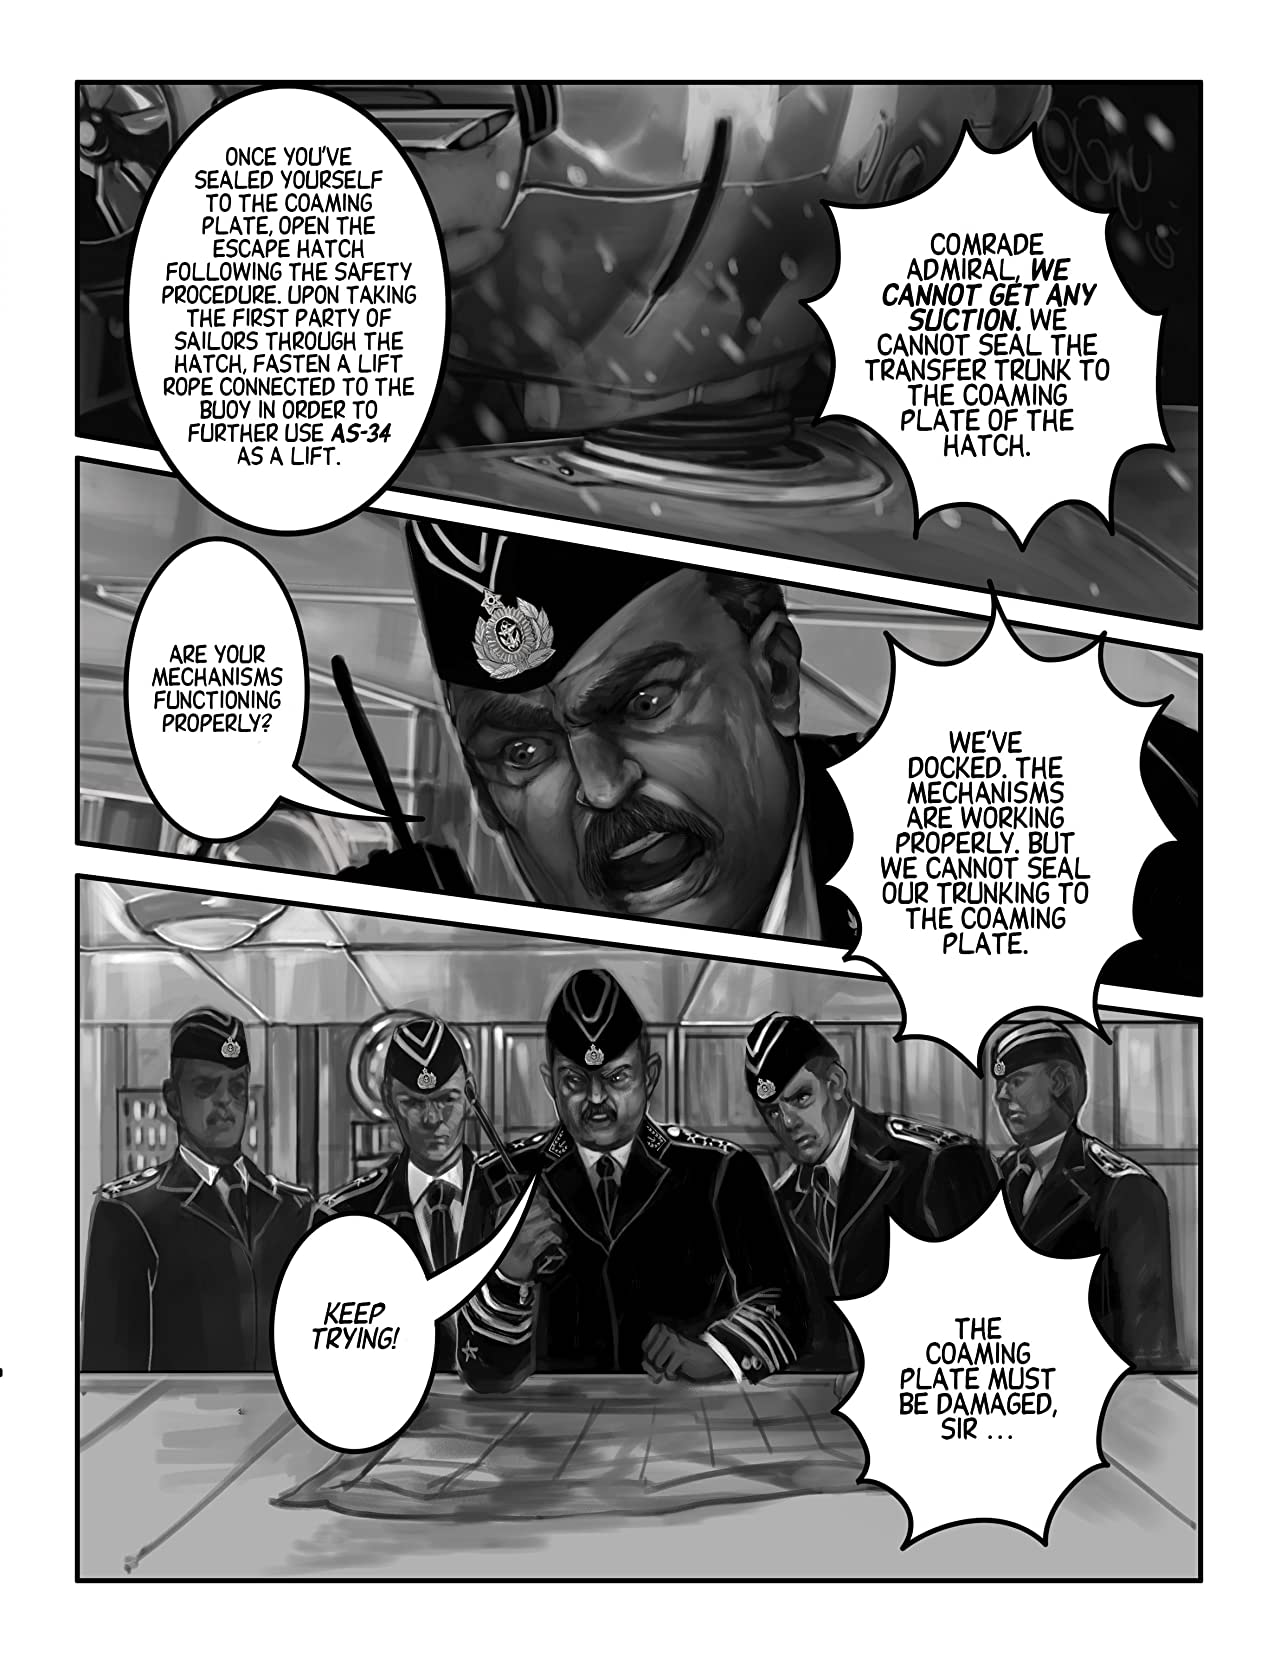 The Kursk #3